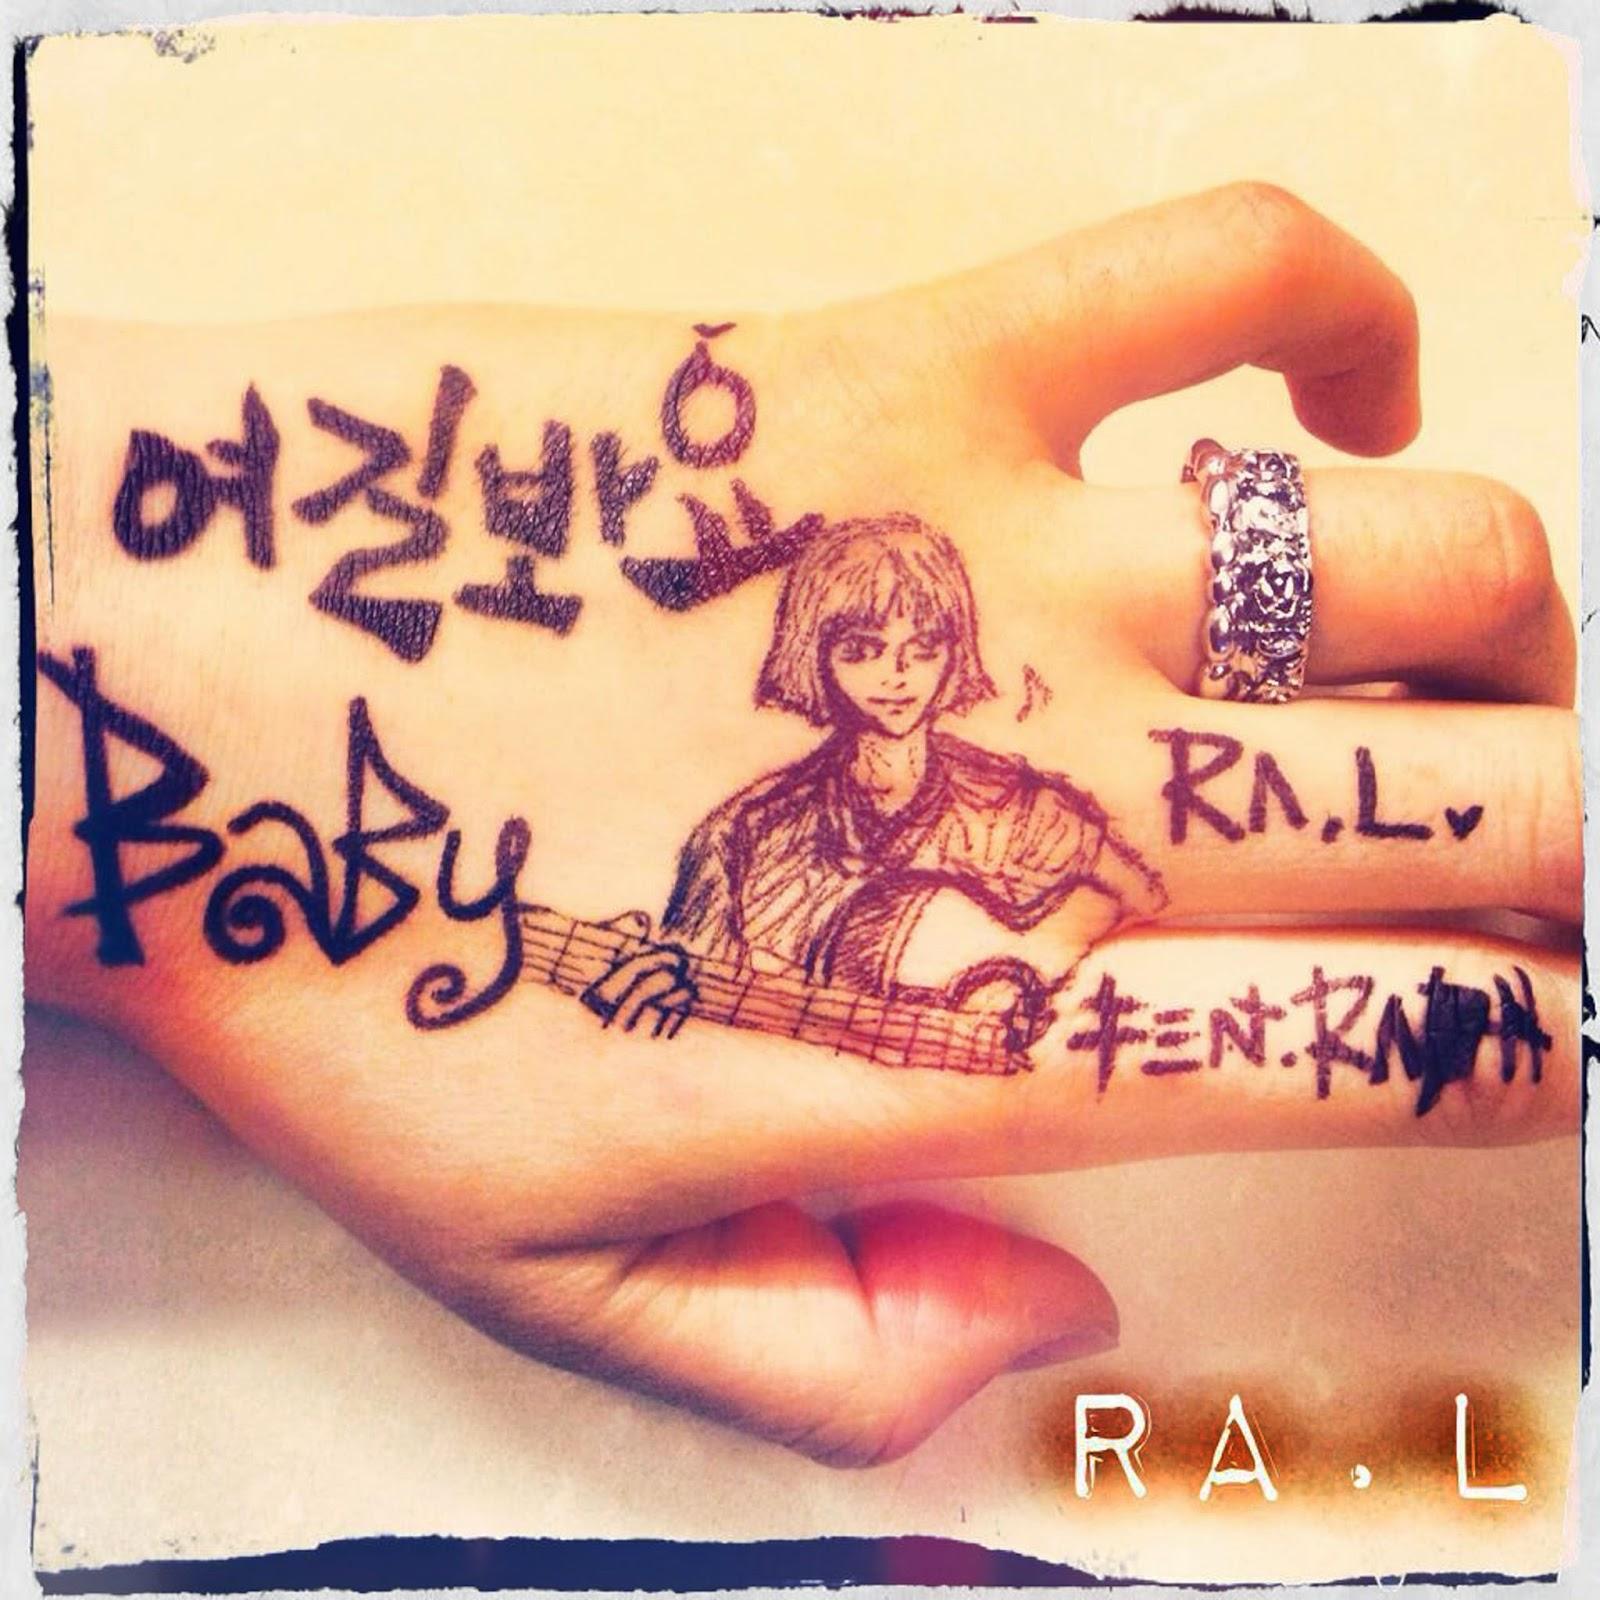 [Single] Ra.L – 여길봐요 Baby (Feat. Raph)